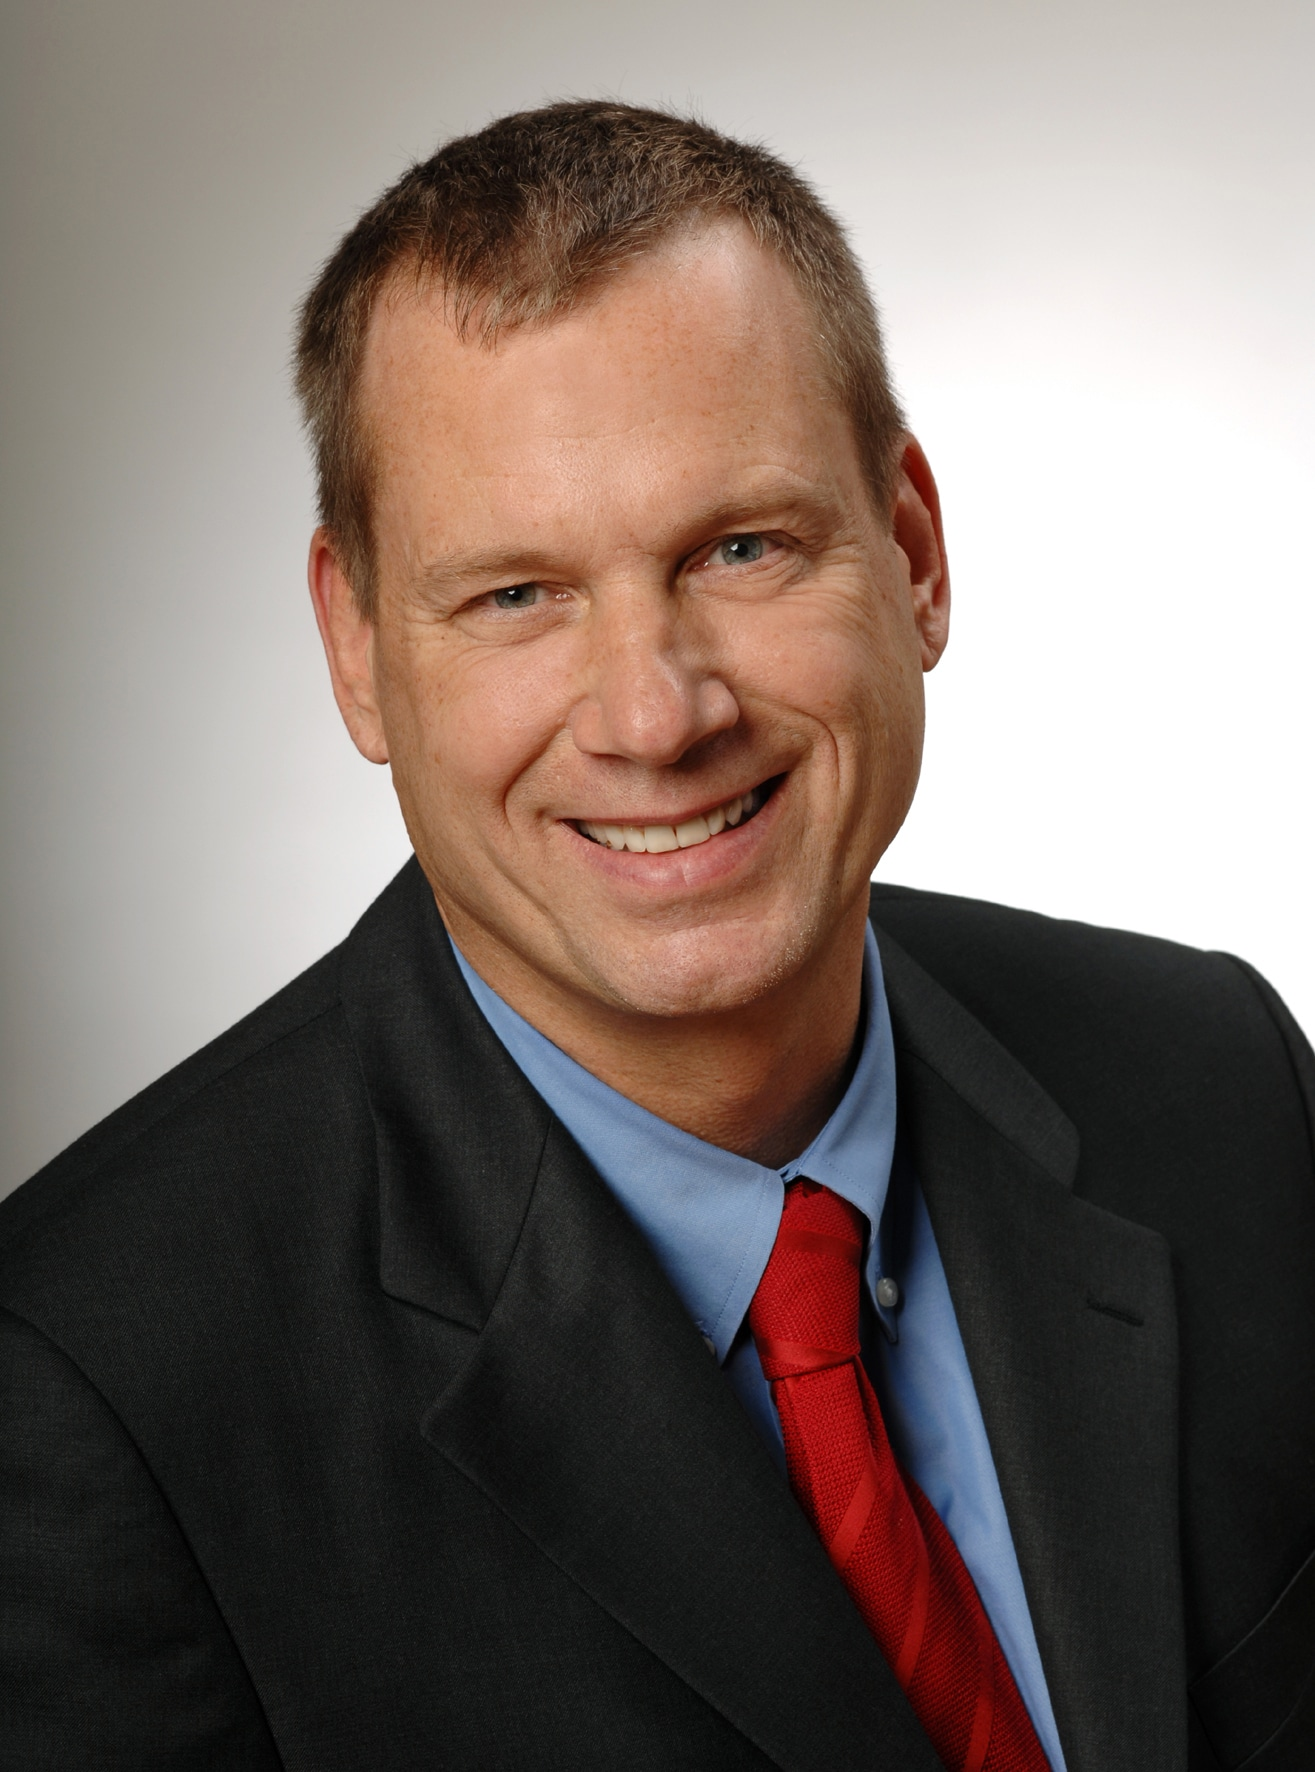 Dr. Frank G. Mathers, Institut dentale Sedierung